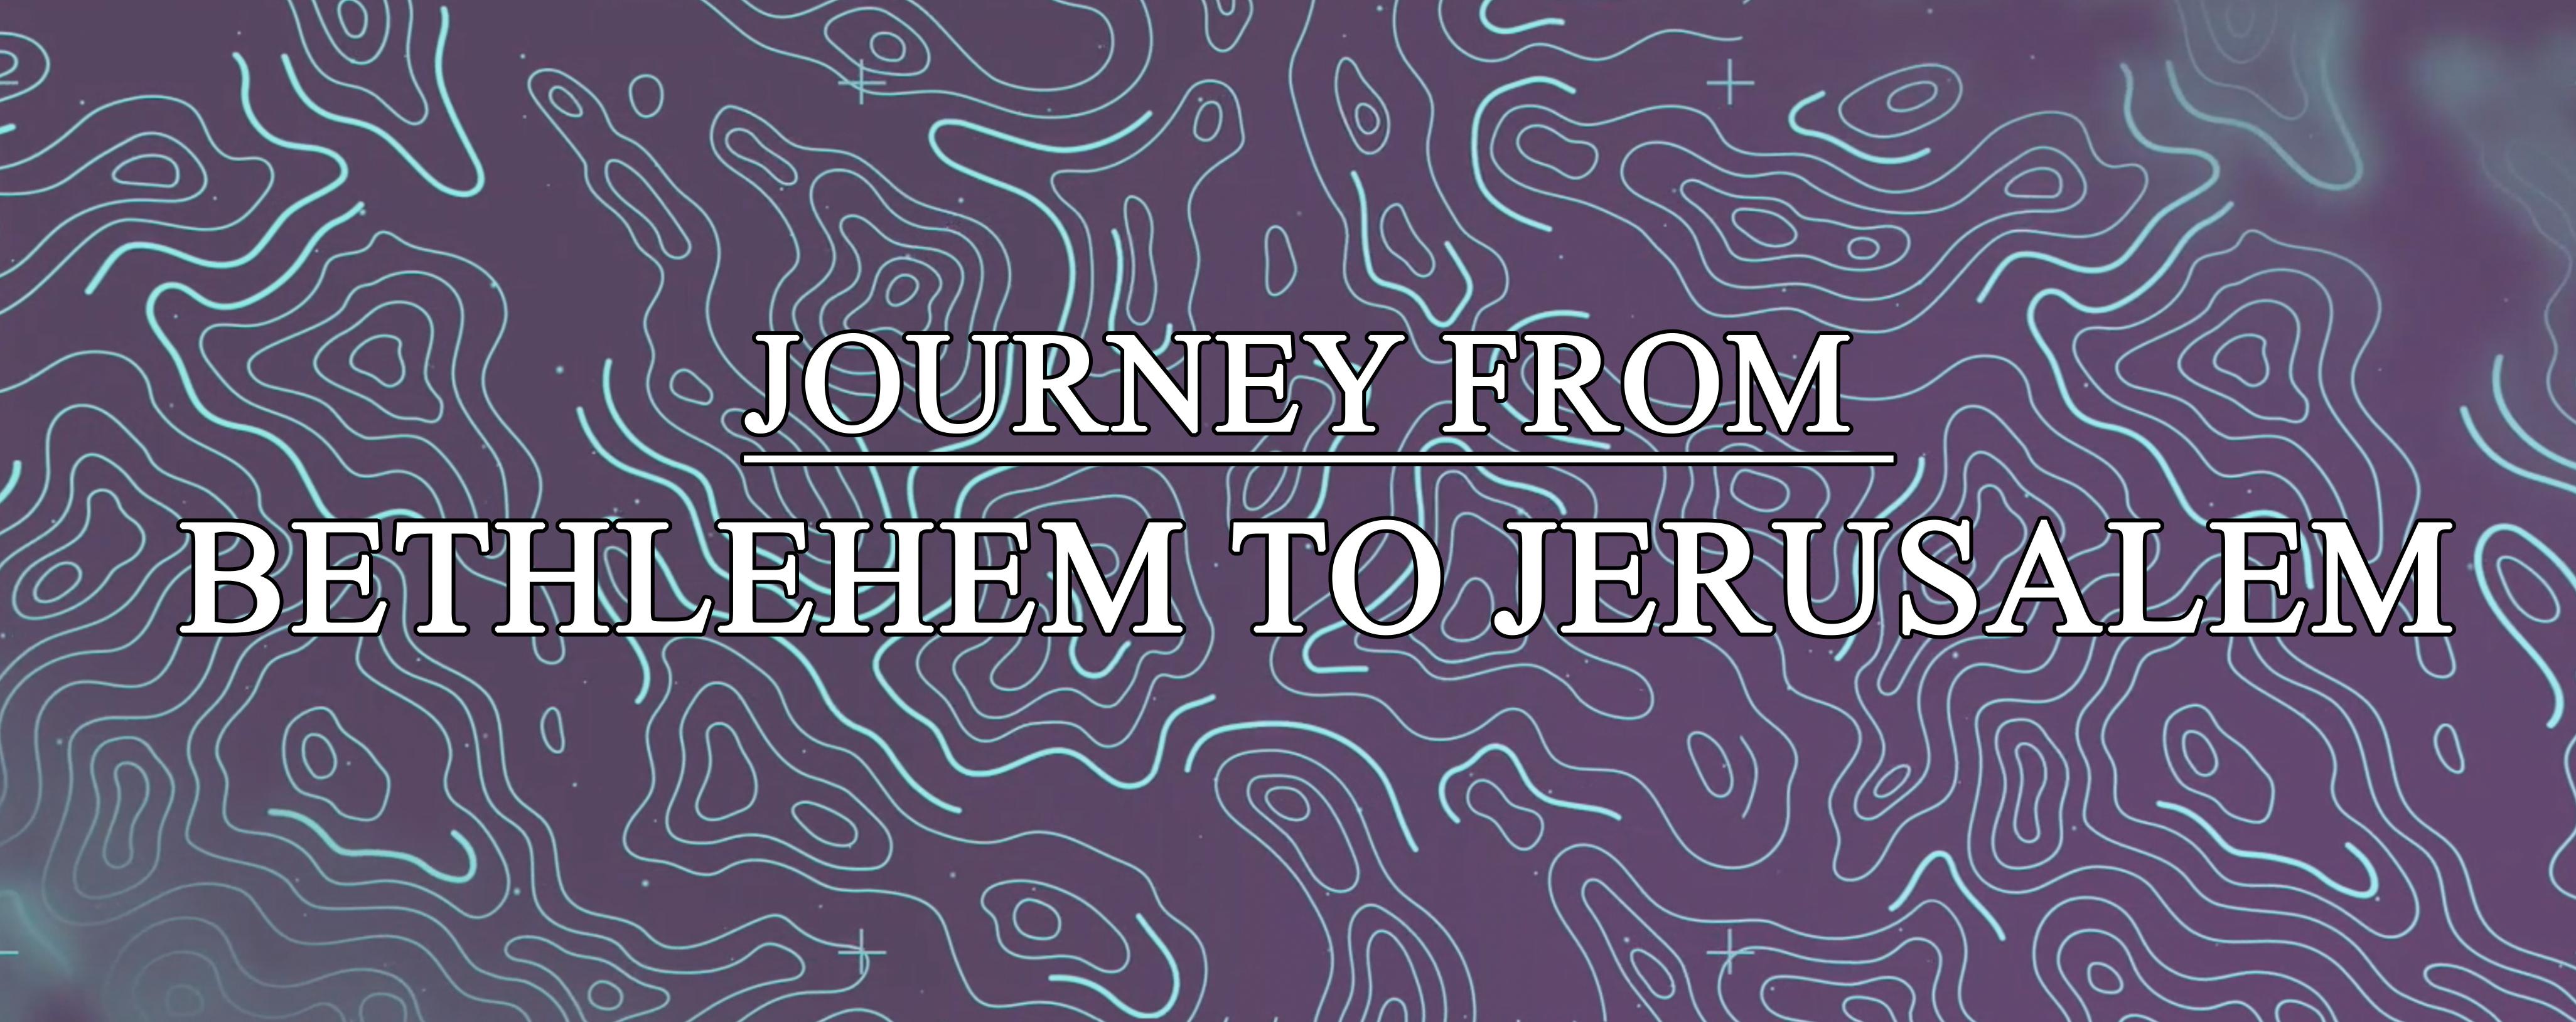 Bethlehem – The Birth of a Movement